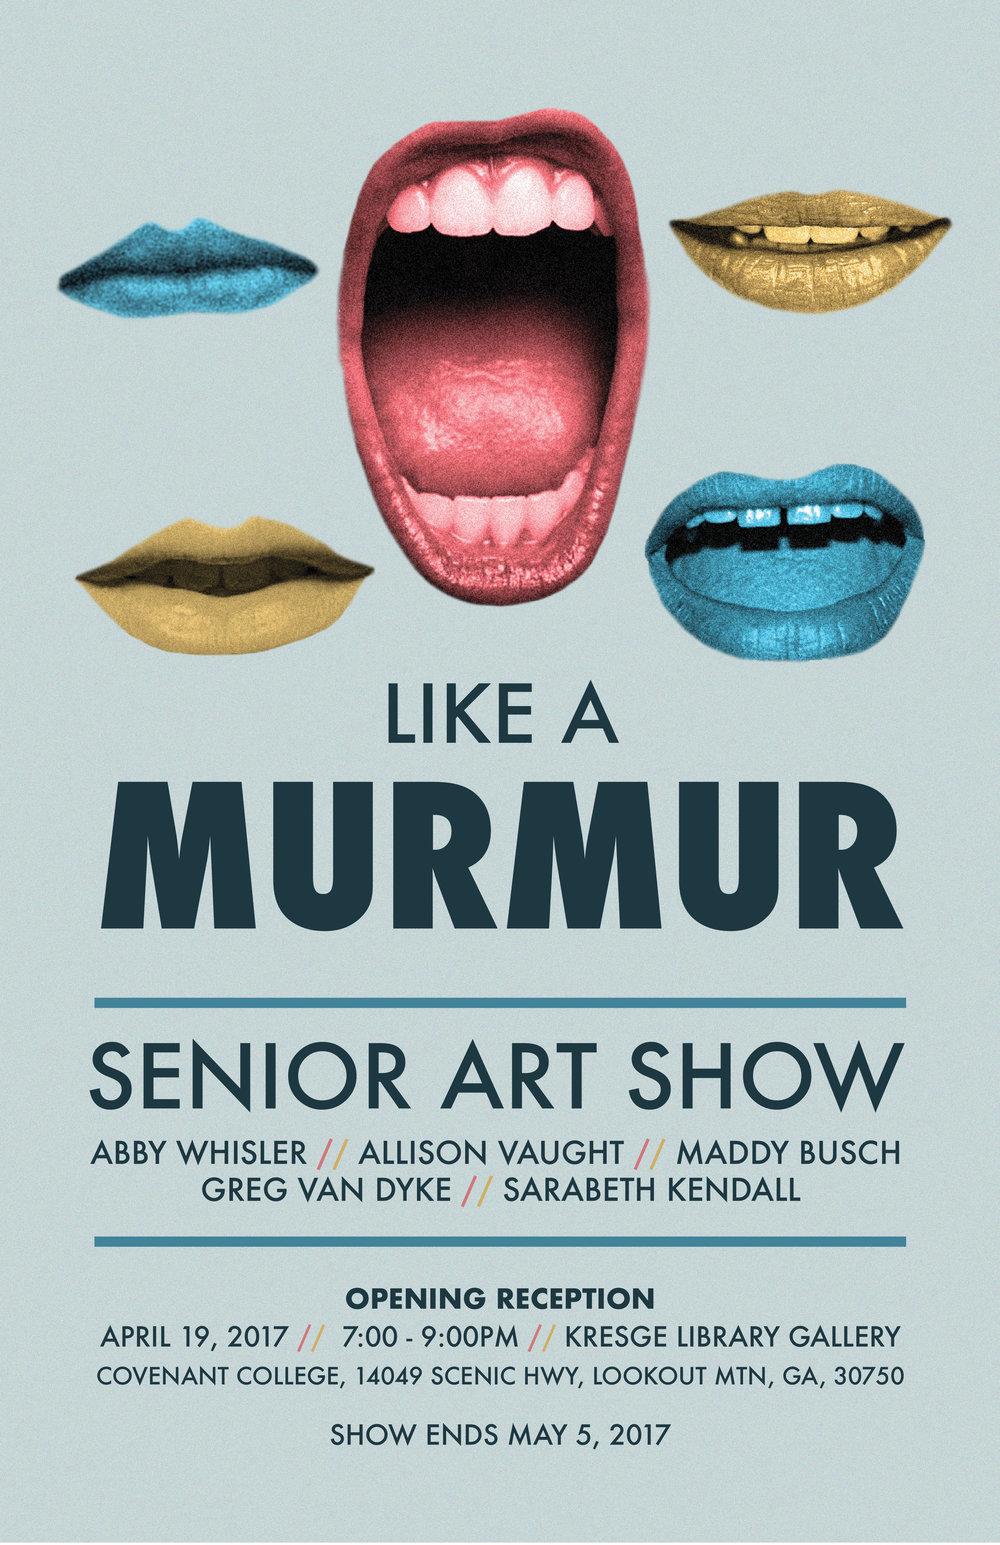 Like A Murmur Poster_Image-01.jpg